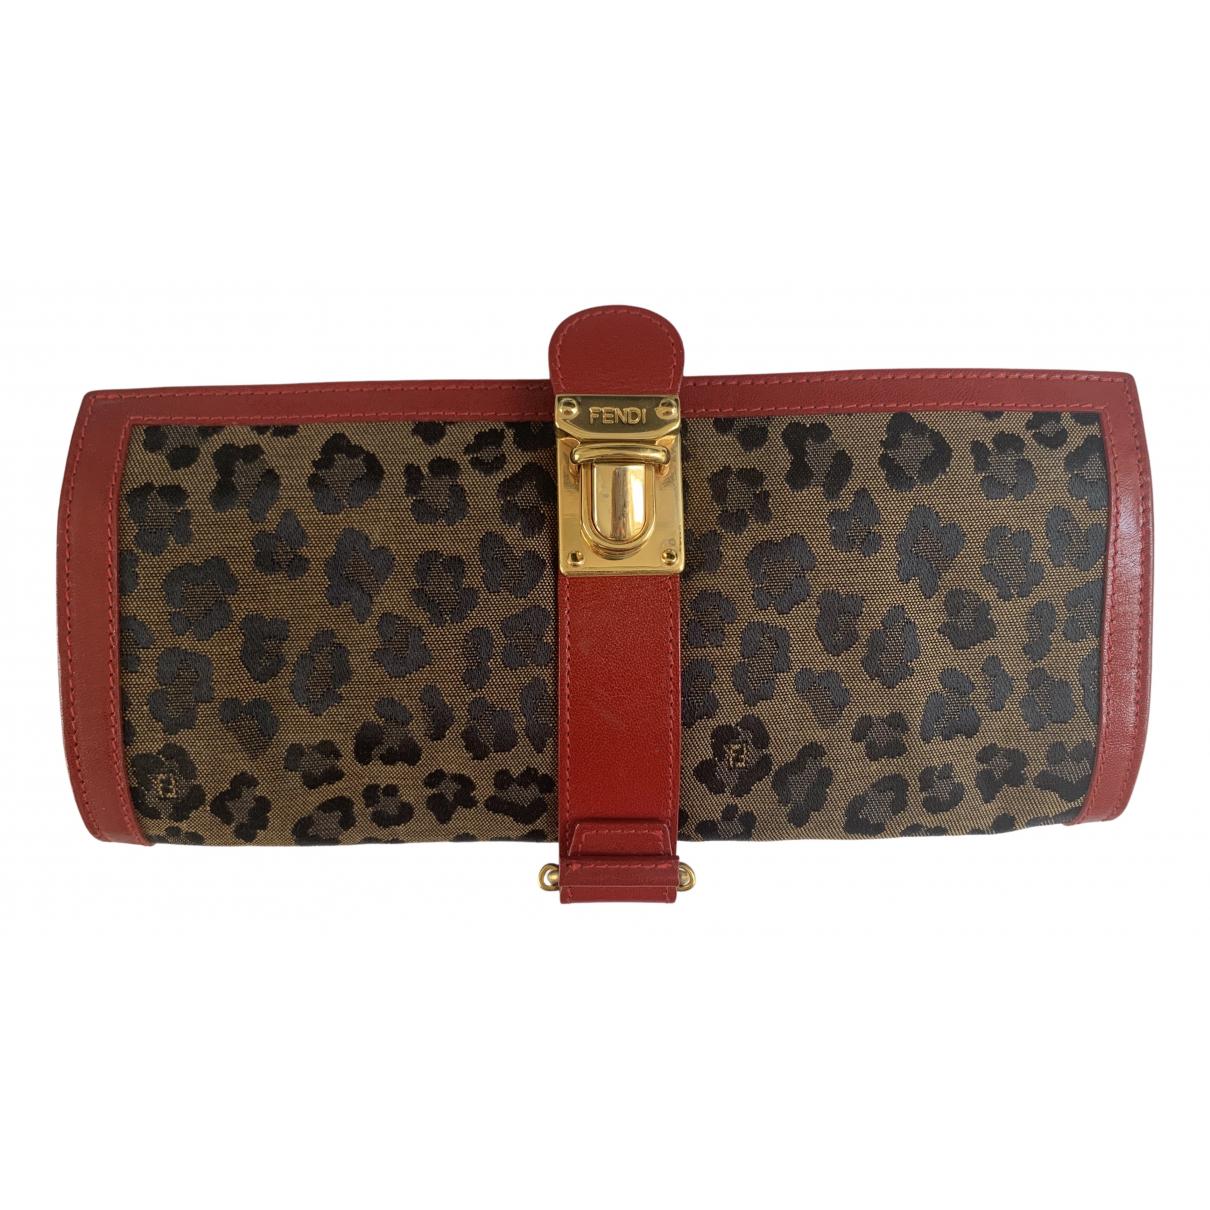 Fendi \N Multicolour Cloth wallet for Women \N